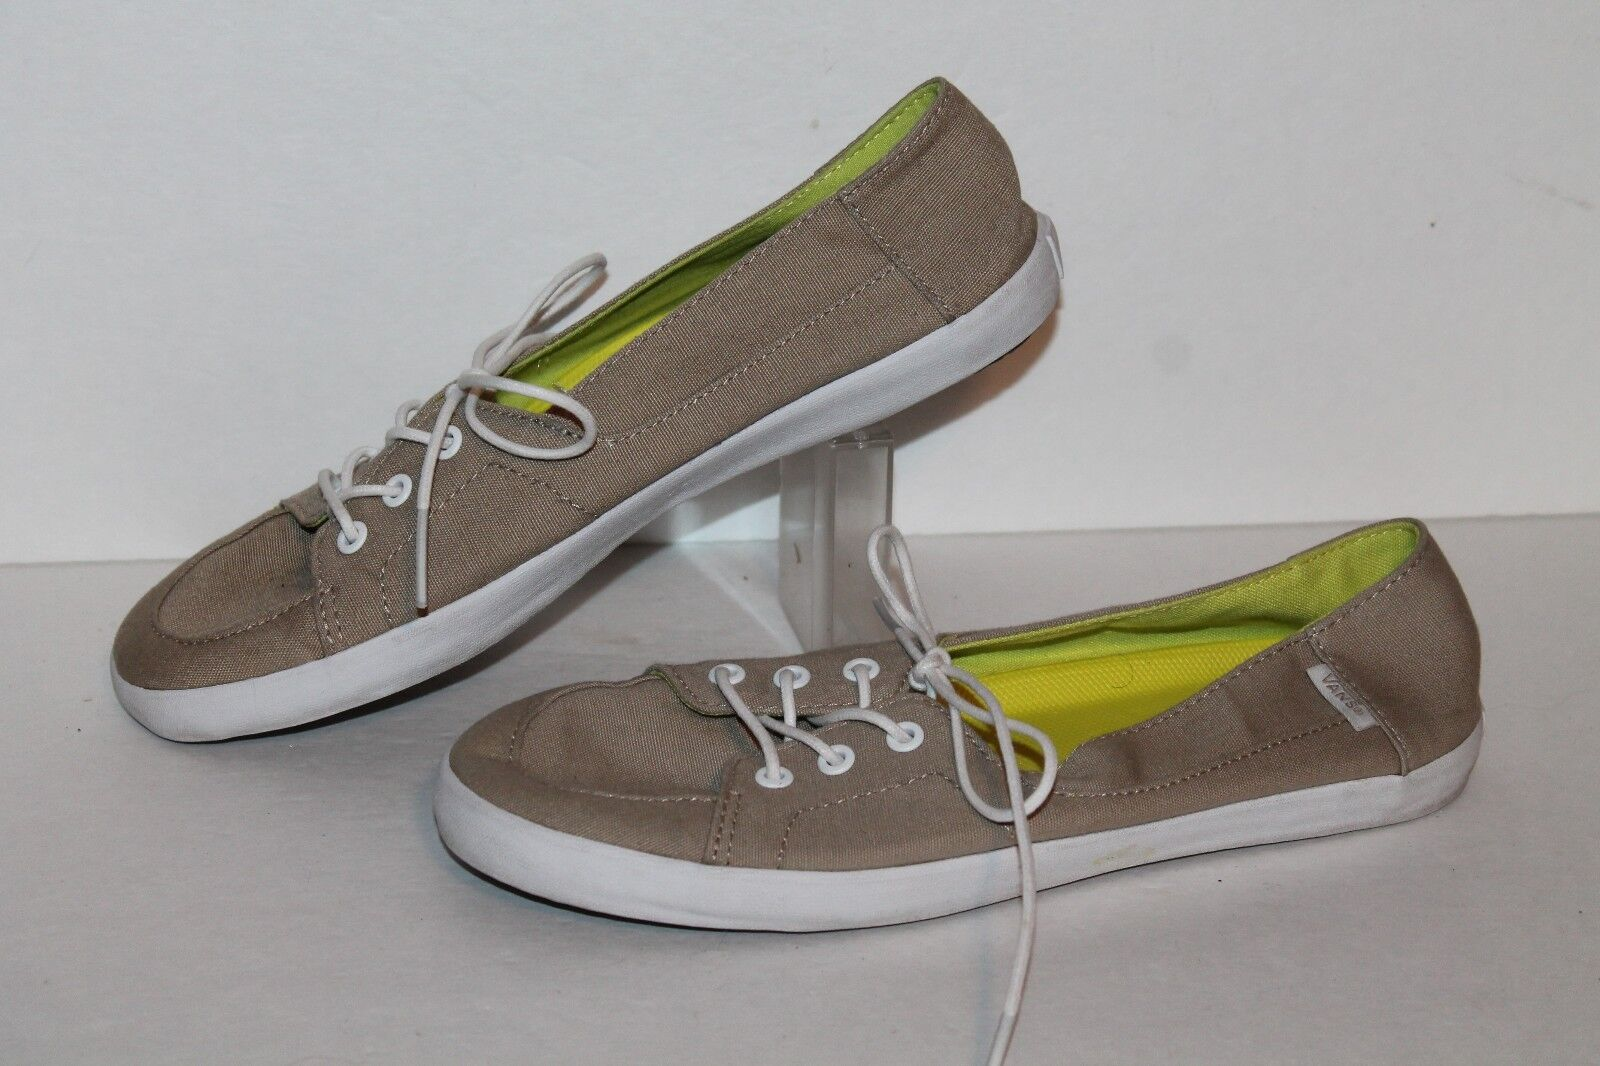 Vans Casual Sneakers, #TB9C, Tan/White, 8  Womens US Size 8 Tan/White, 2655c9